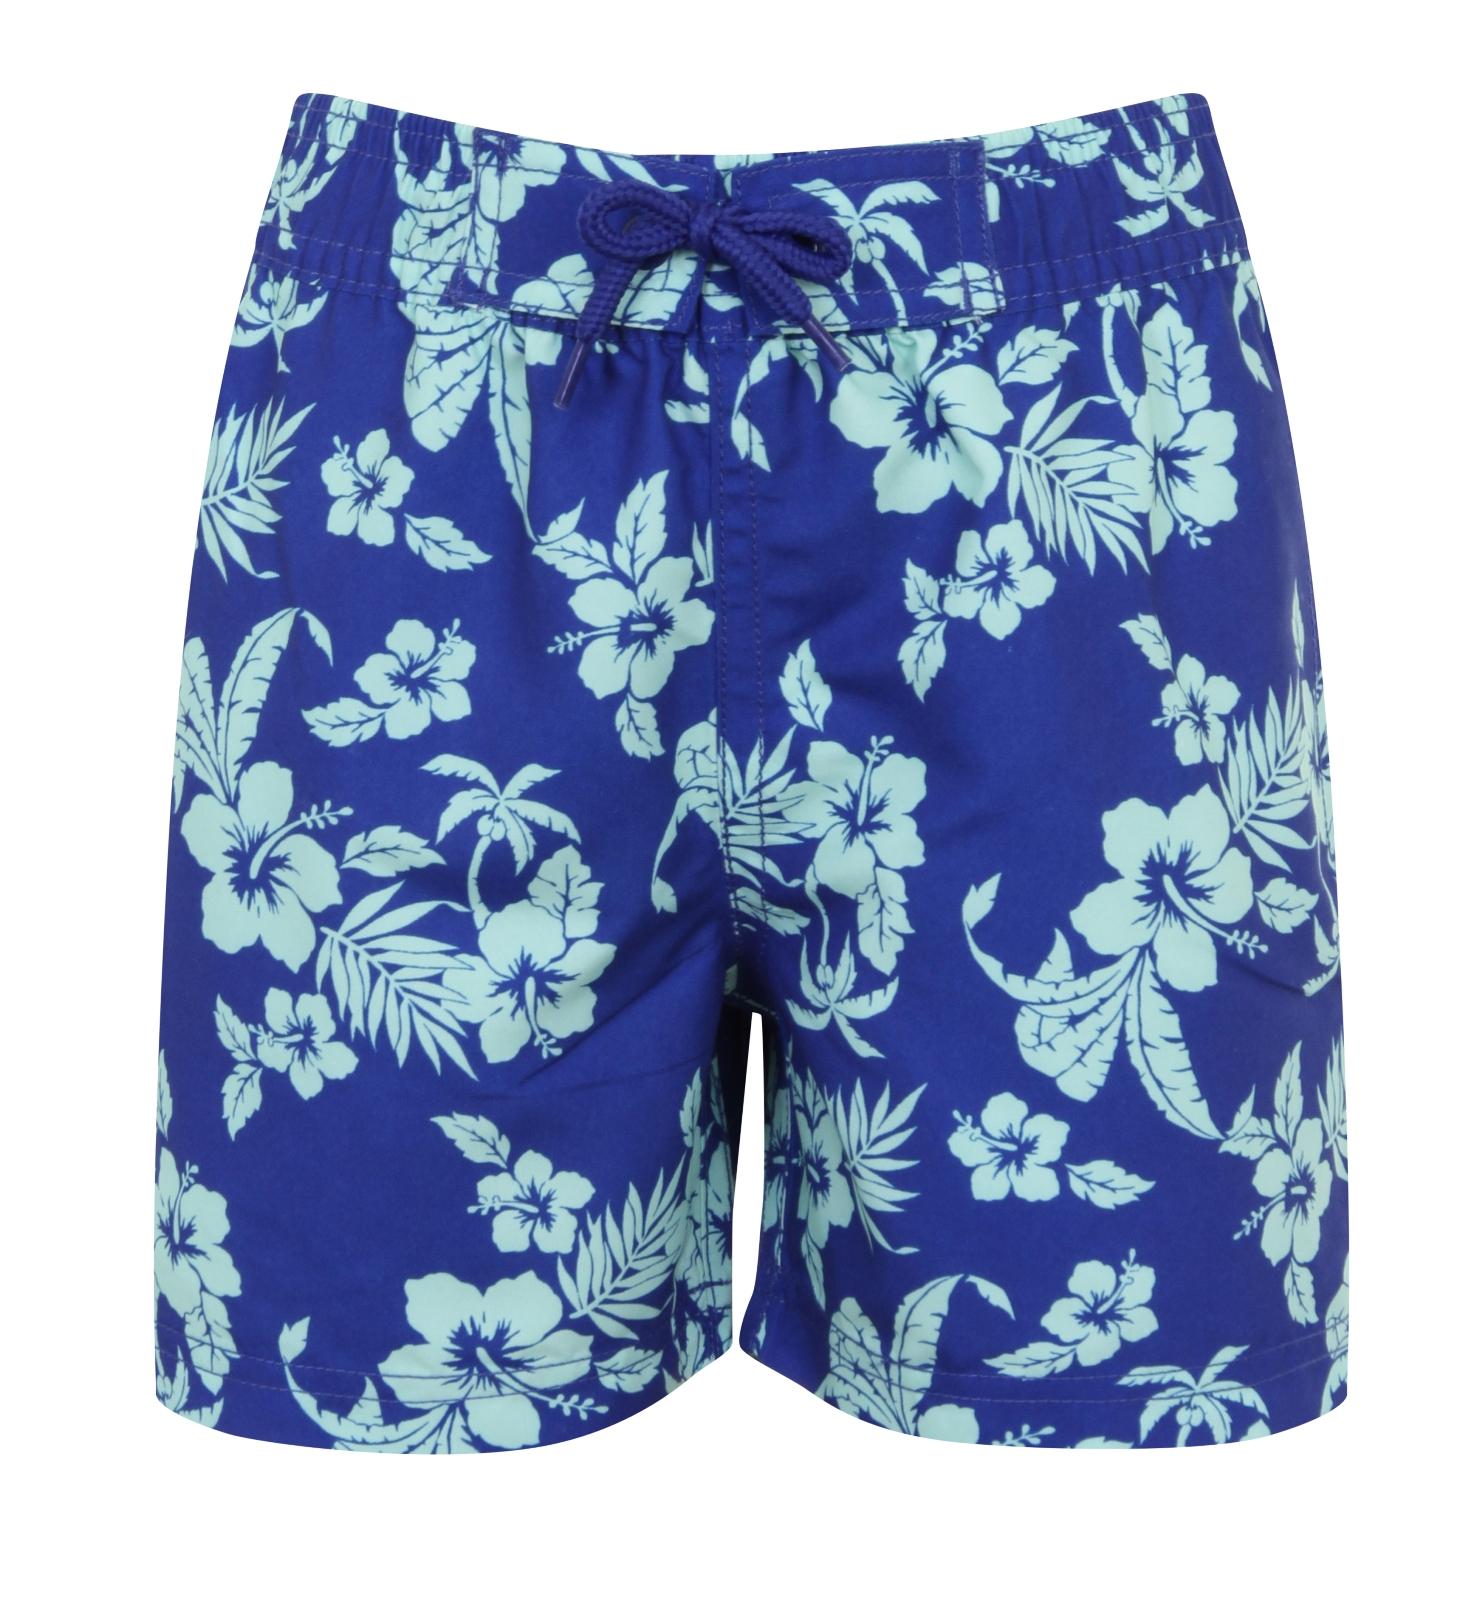 Mens Swimming Shorts Holiday Beach Swim Board Shorts Trunks Gents Swimwear Size